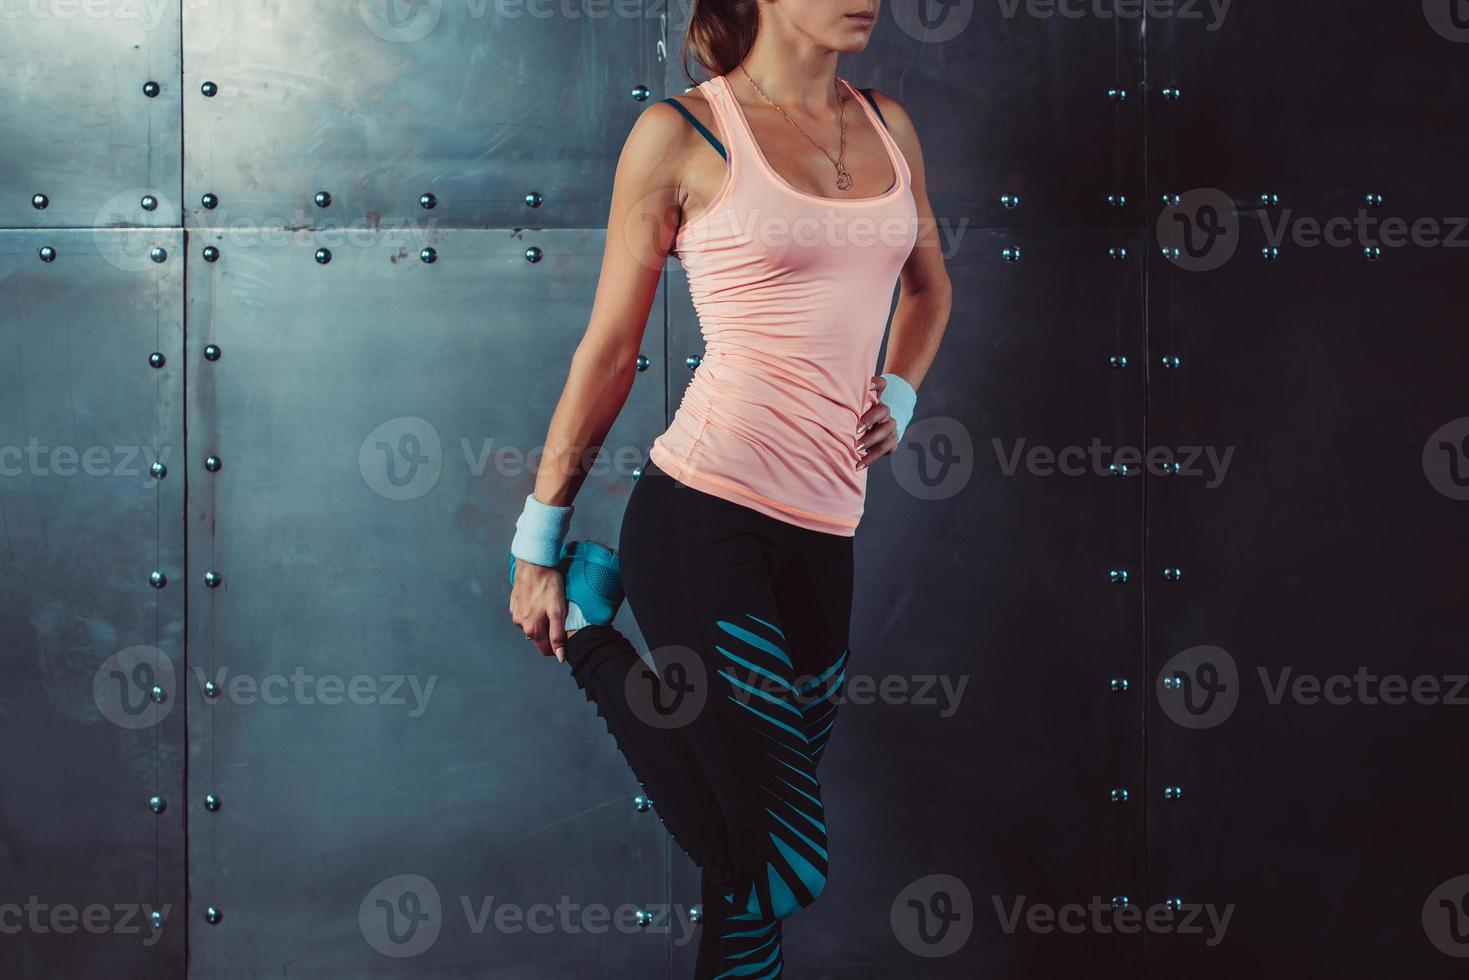 Fitness mujer estirando sus piernas ajuste corredor femenino haciendo estiramientos foto